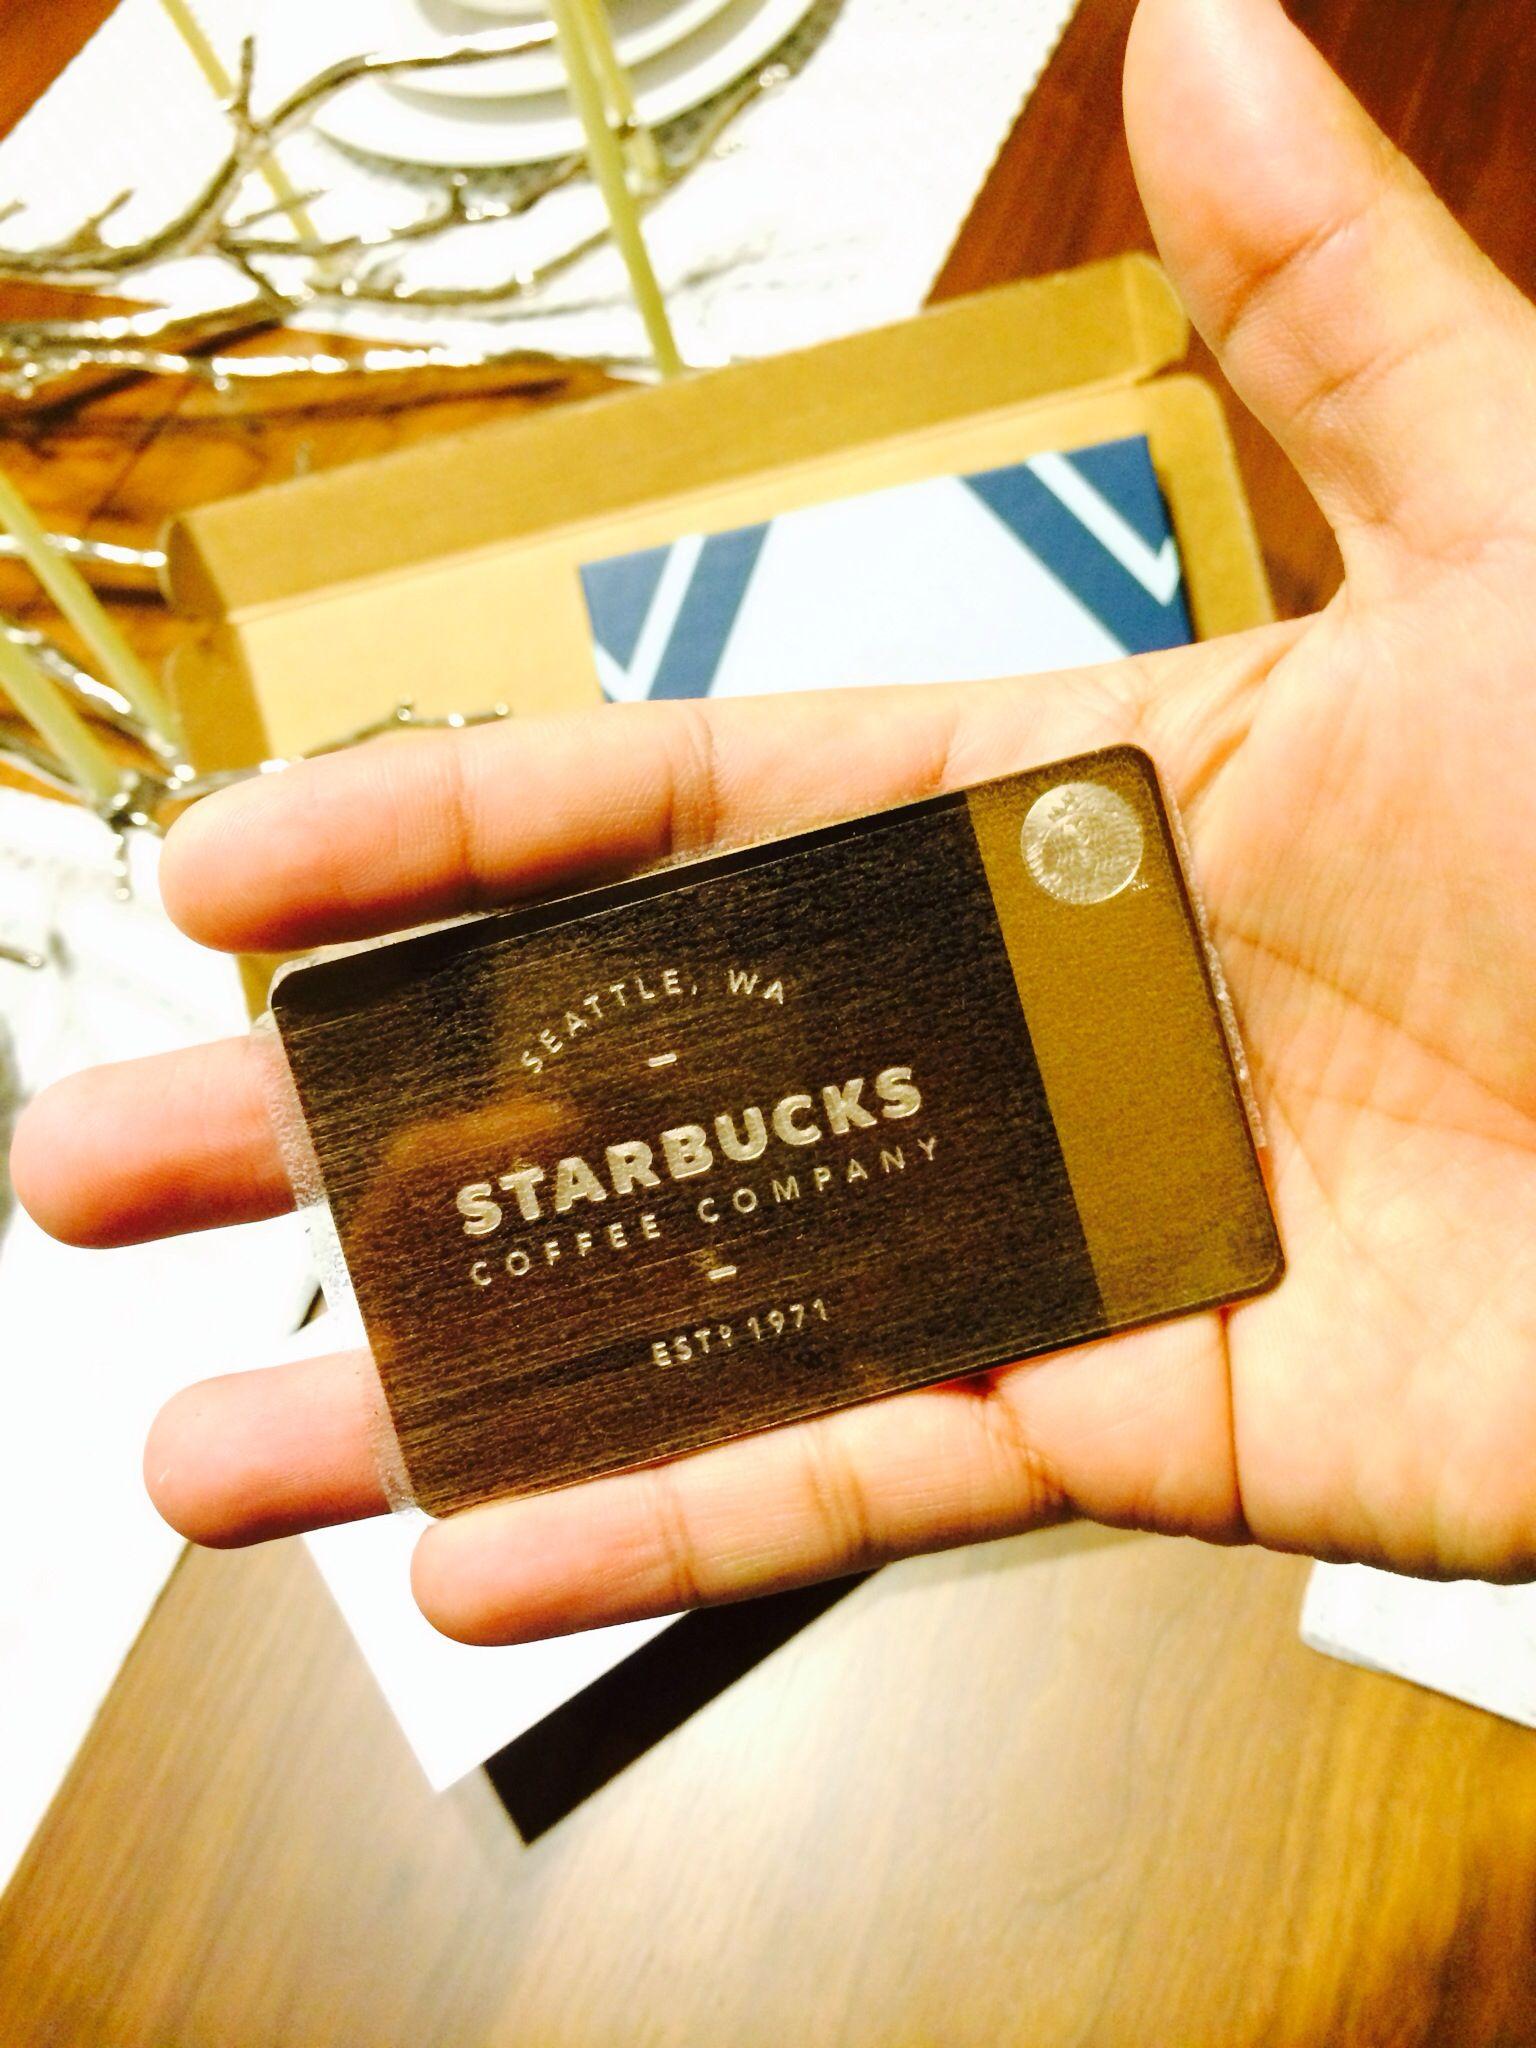 Limited edition starbucks rose gold card starbucks